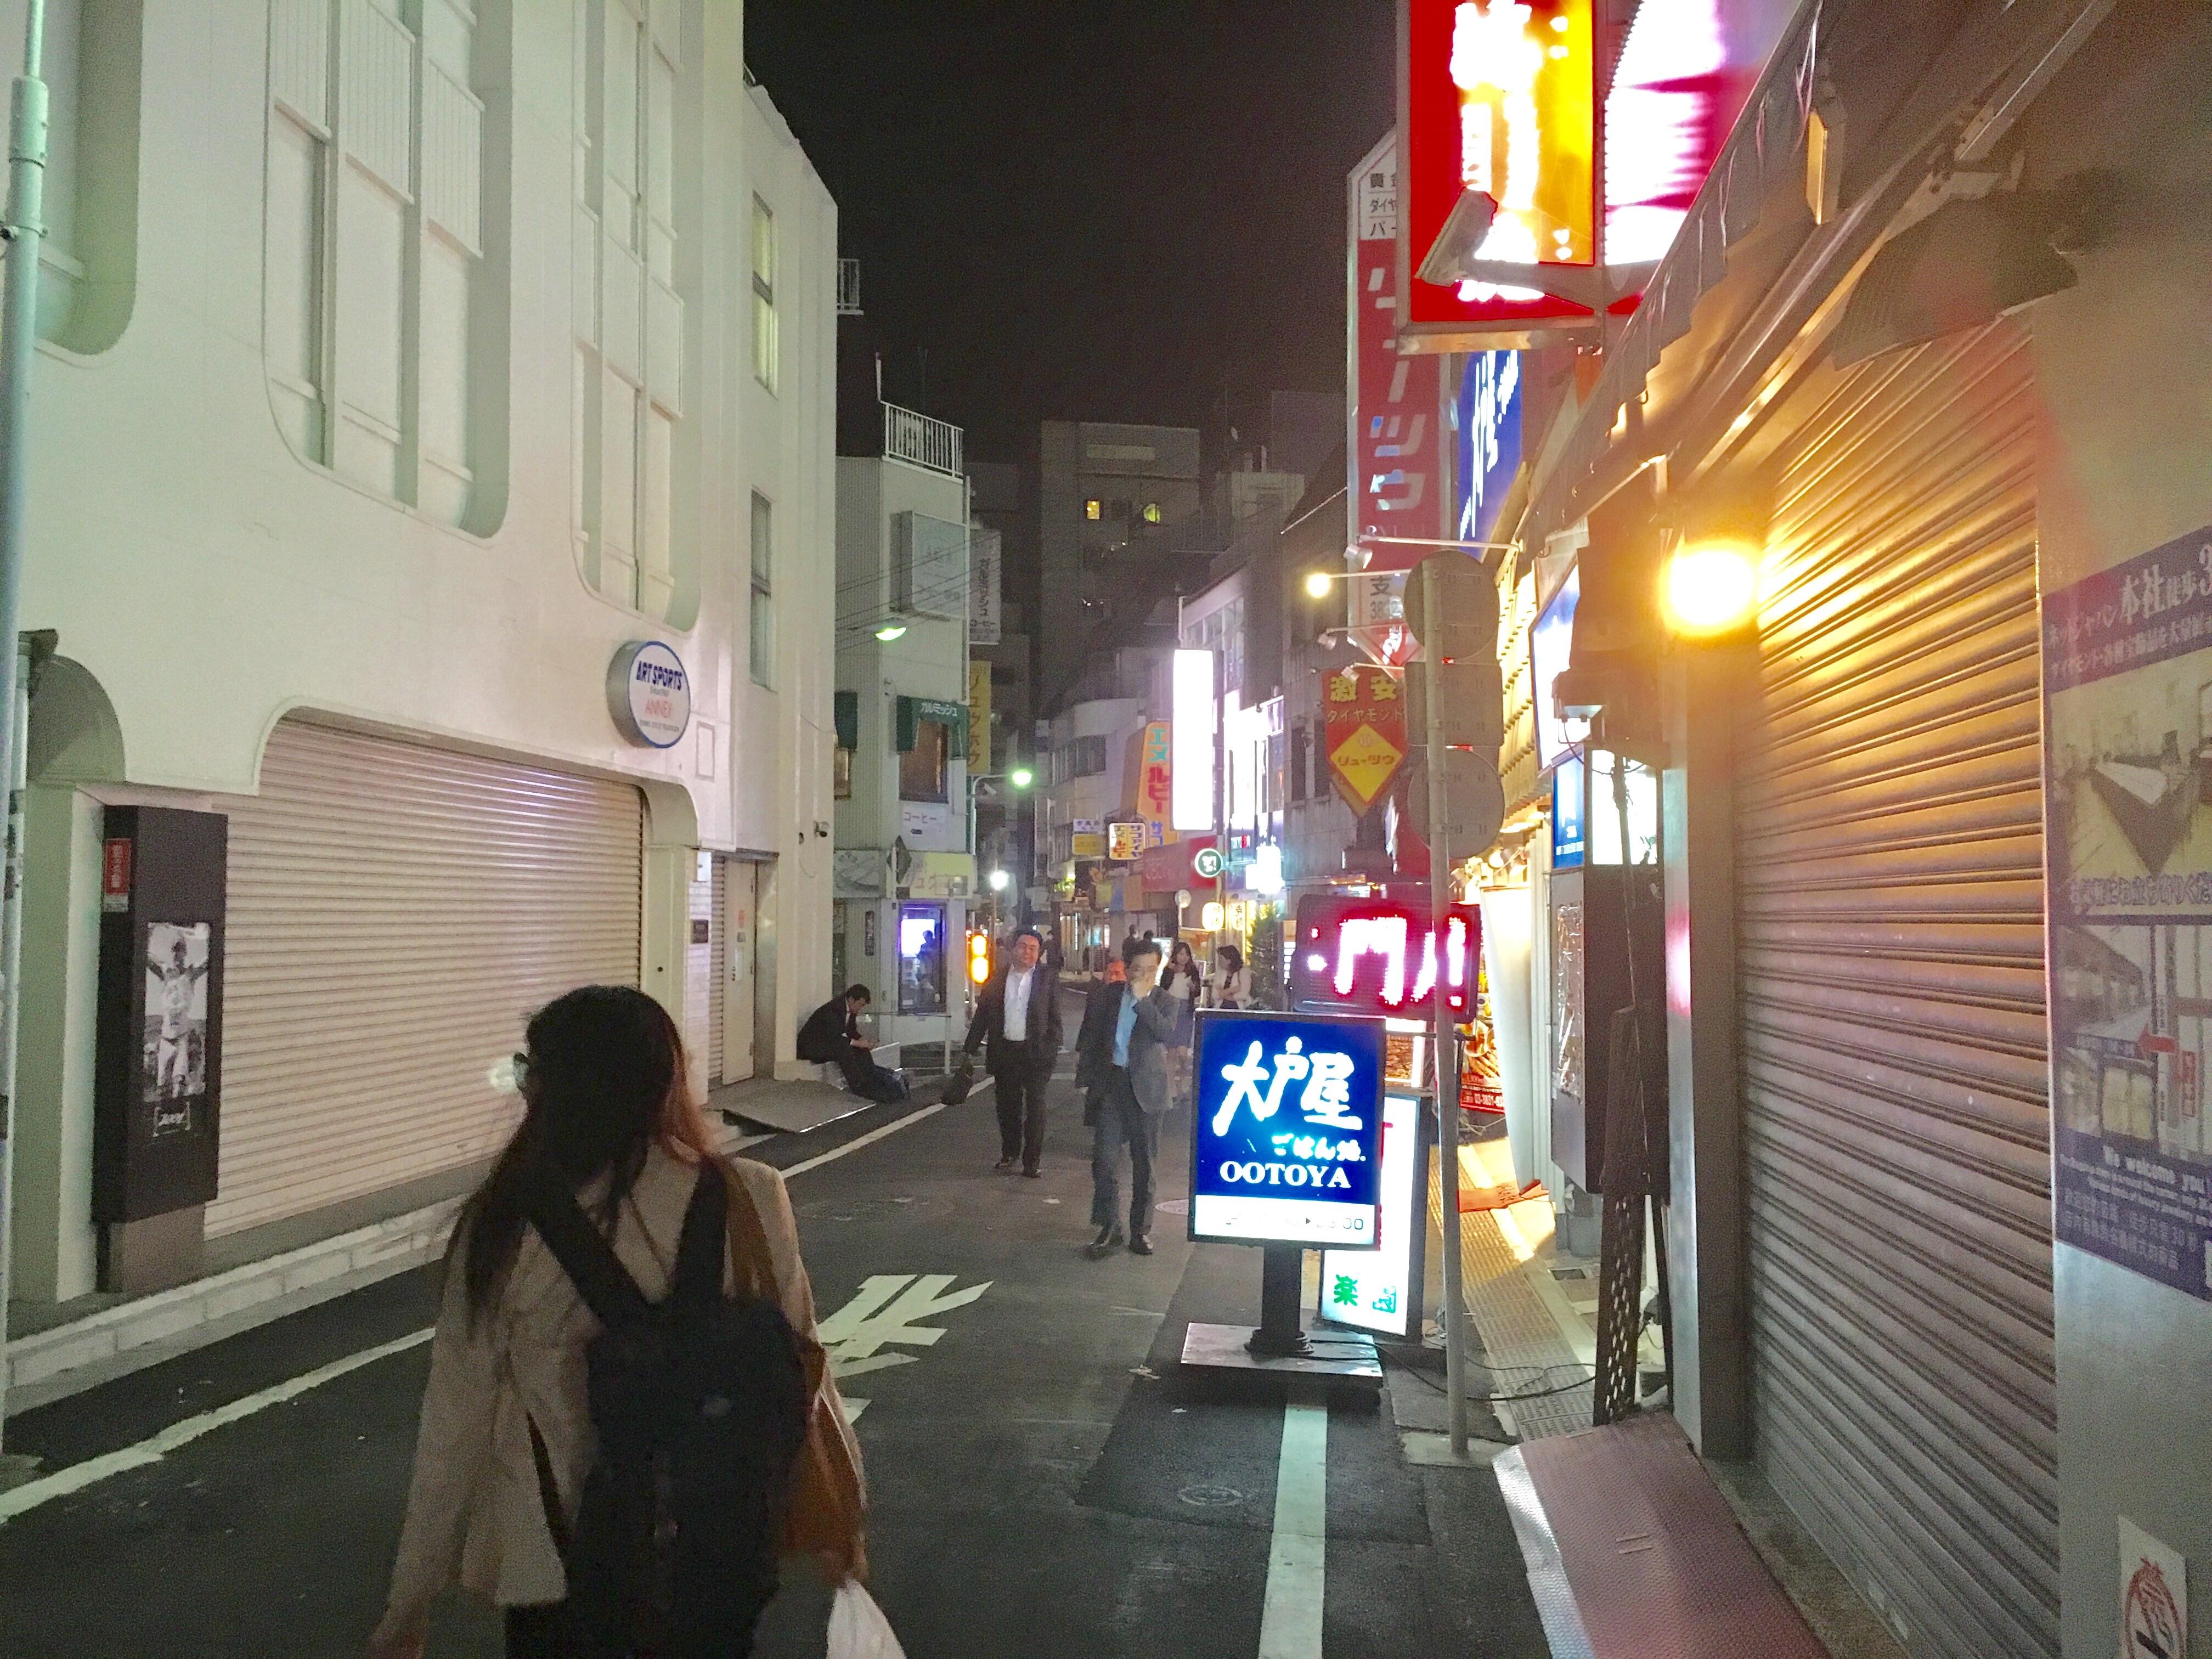 f:id:SoichiroIkeshita:20170606154148j:image